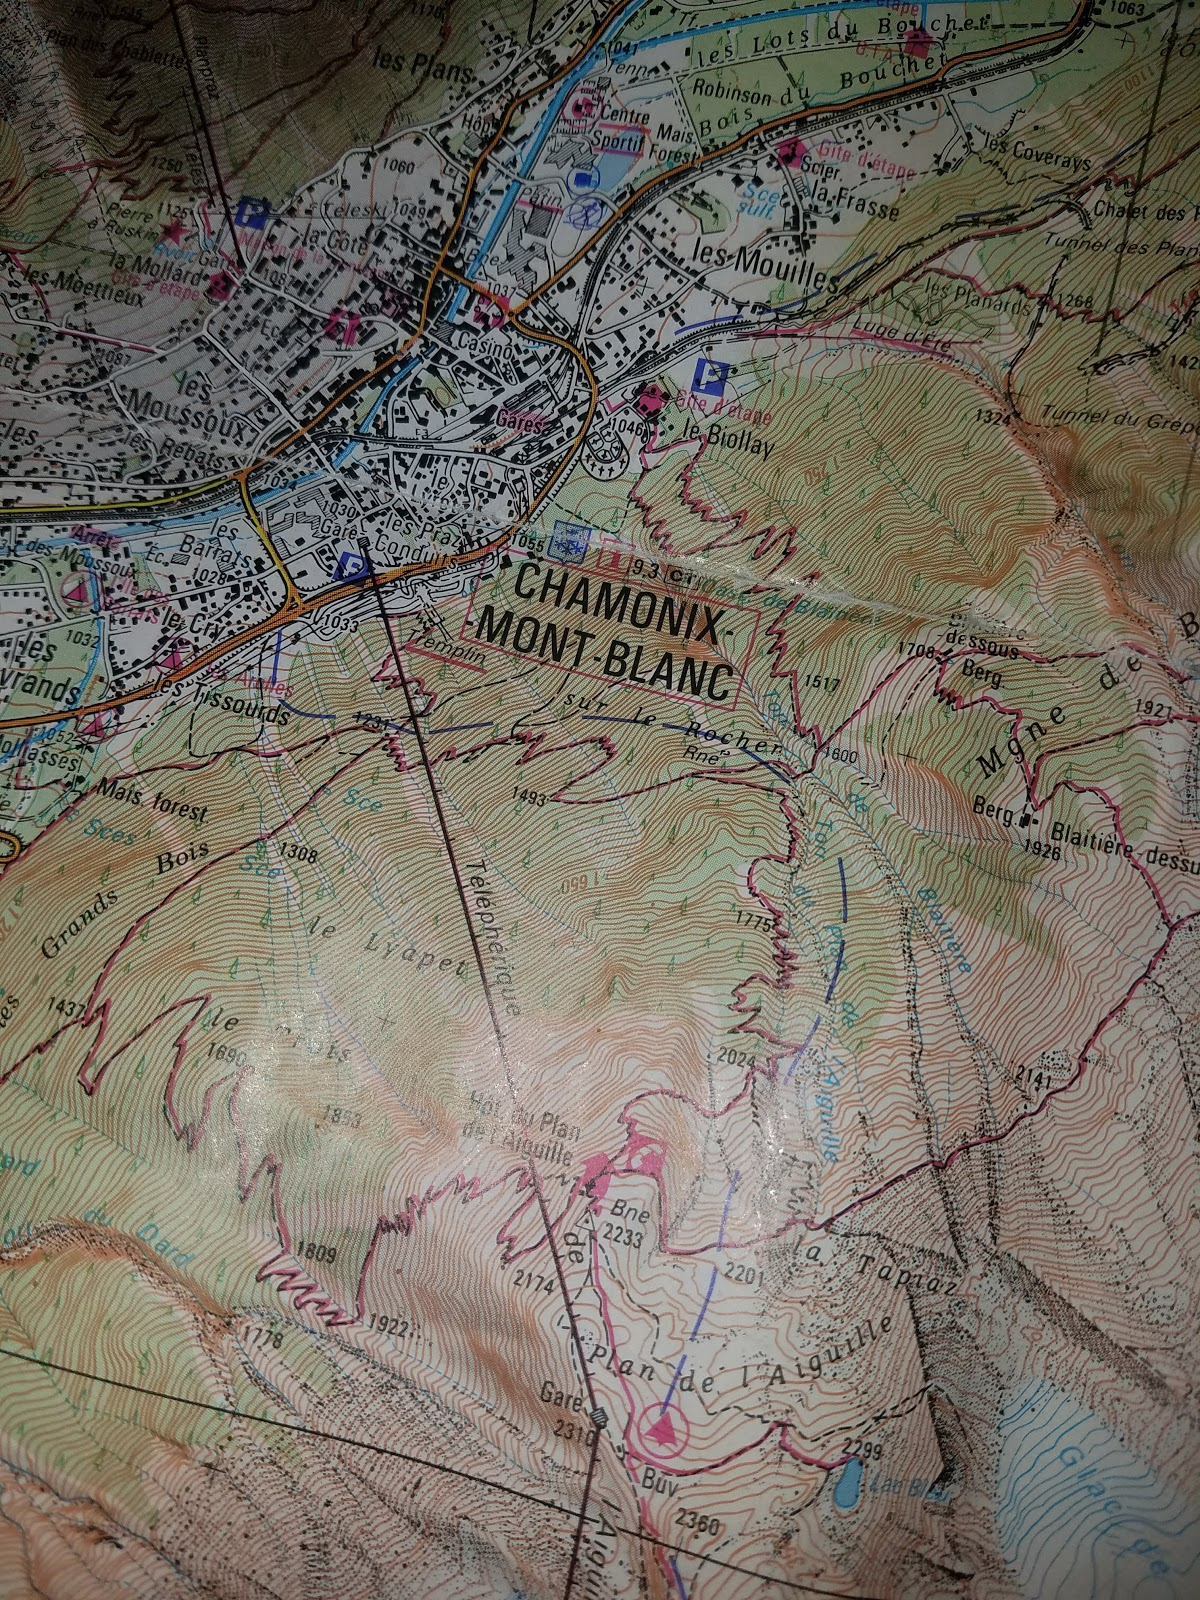 Hike 4K's - The NH 4,000 Footers (and other hikes): May 2018  Footers Nh Map on nh snowmobile map, mt. willard nh trail map, lincoln nh map, nh new hampshire map, nh hiking map, mt. washington nh trail map, madison nh map, white lake nh map, zealand nh map, nh zip code map, nh mountains map, nh ski areas map, nh camping map,